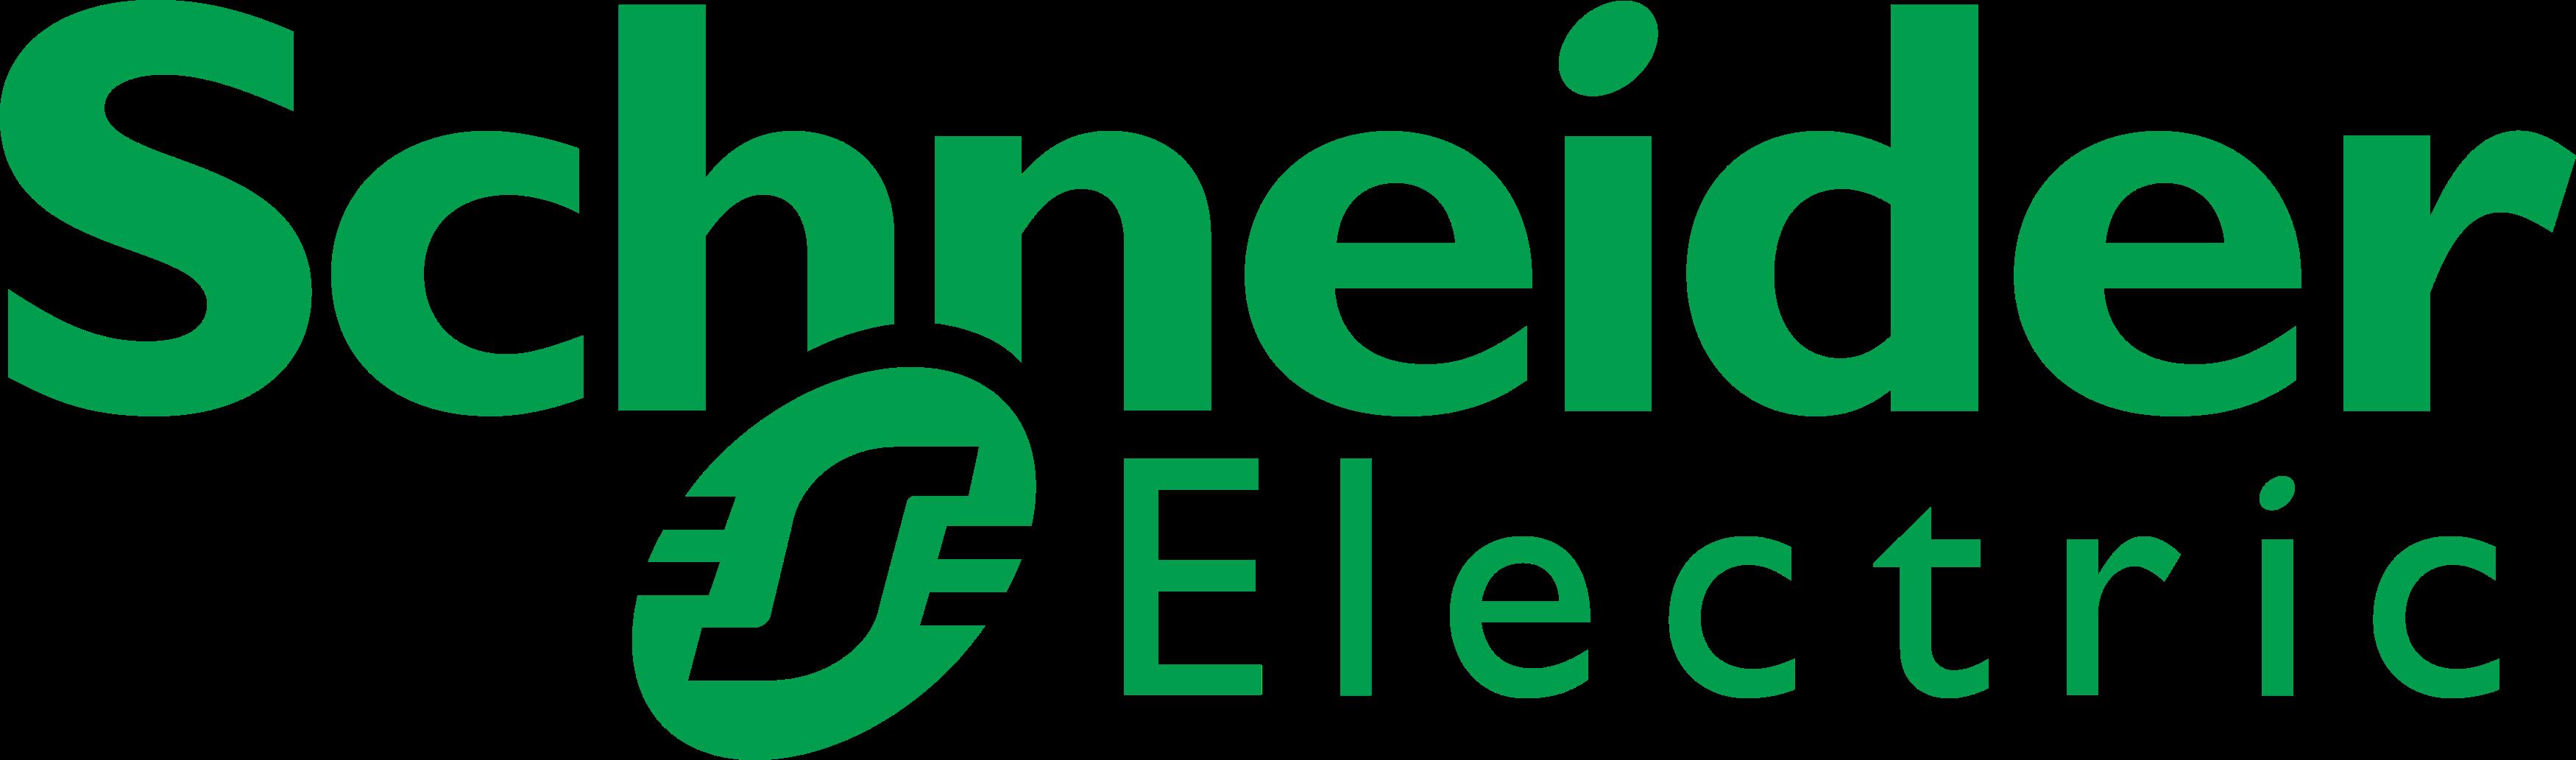 Schneider Electric Transparent - PROPEL Energy Tech Forum